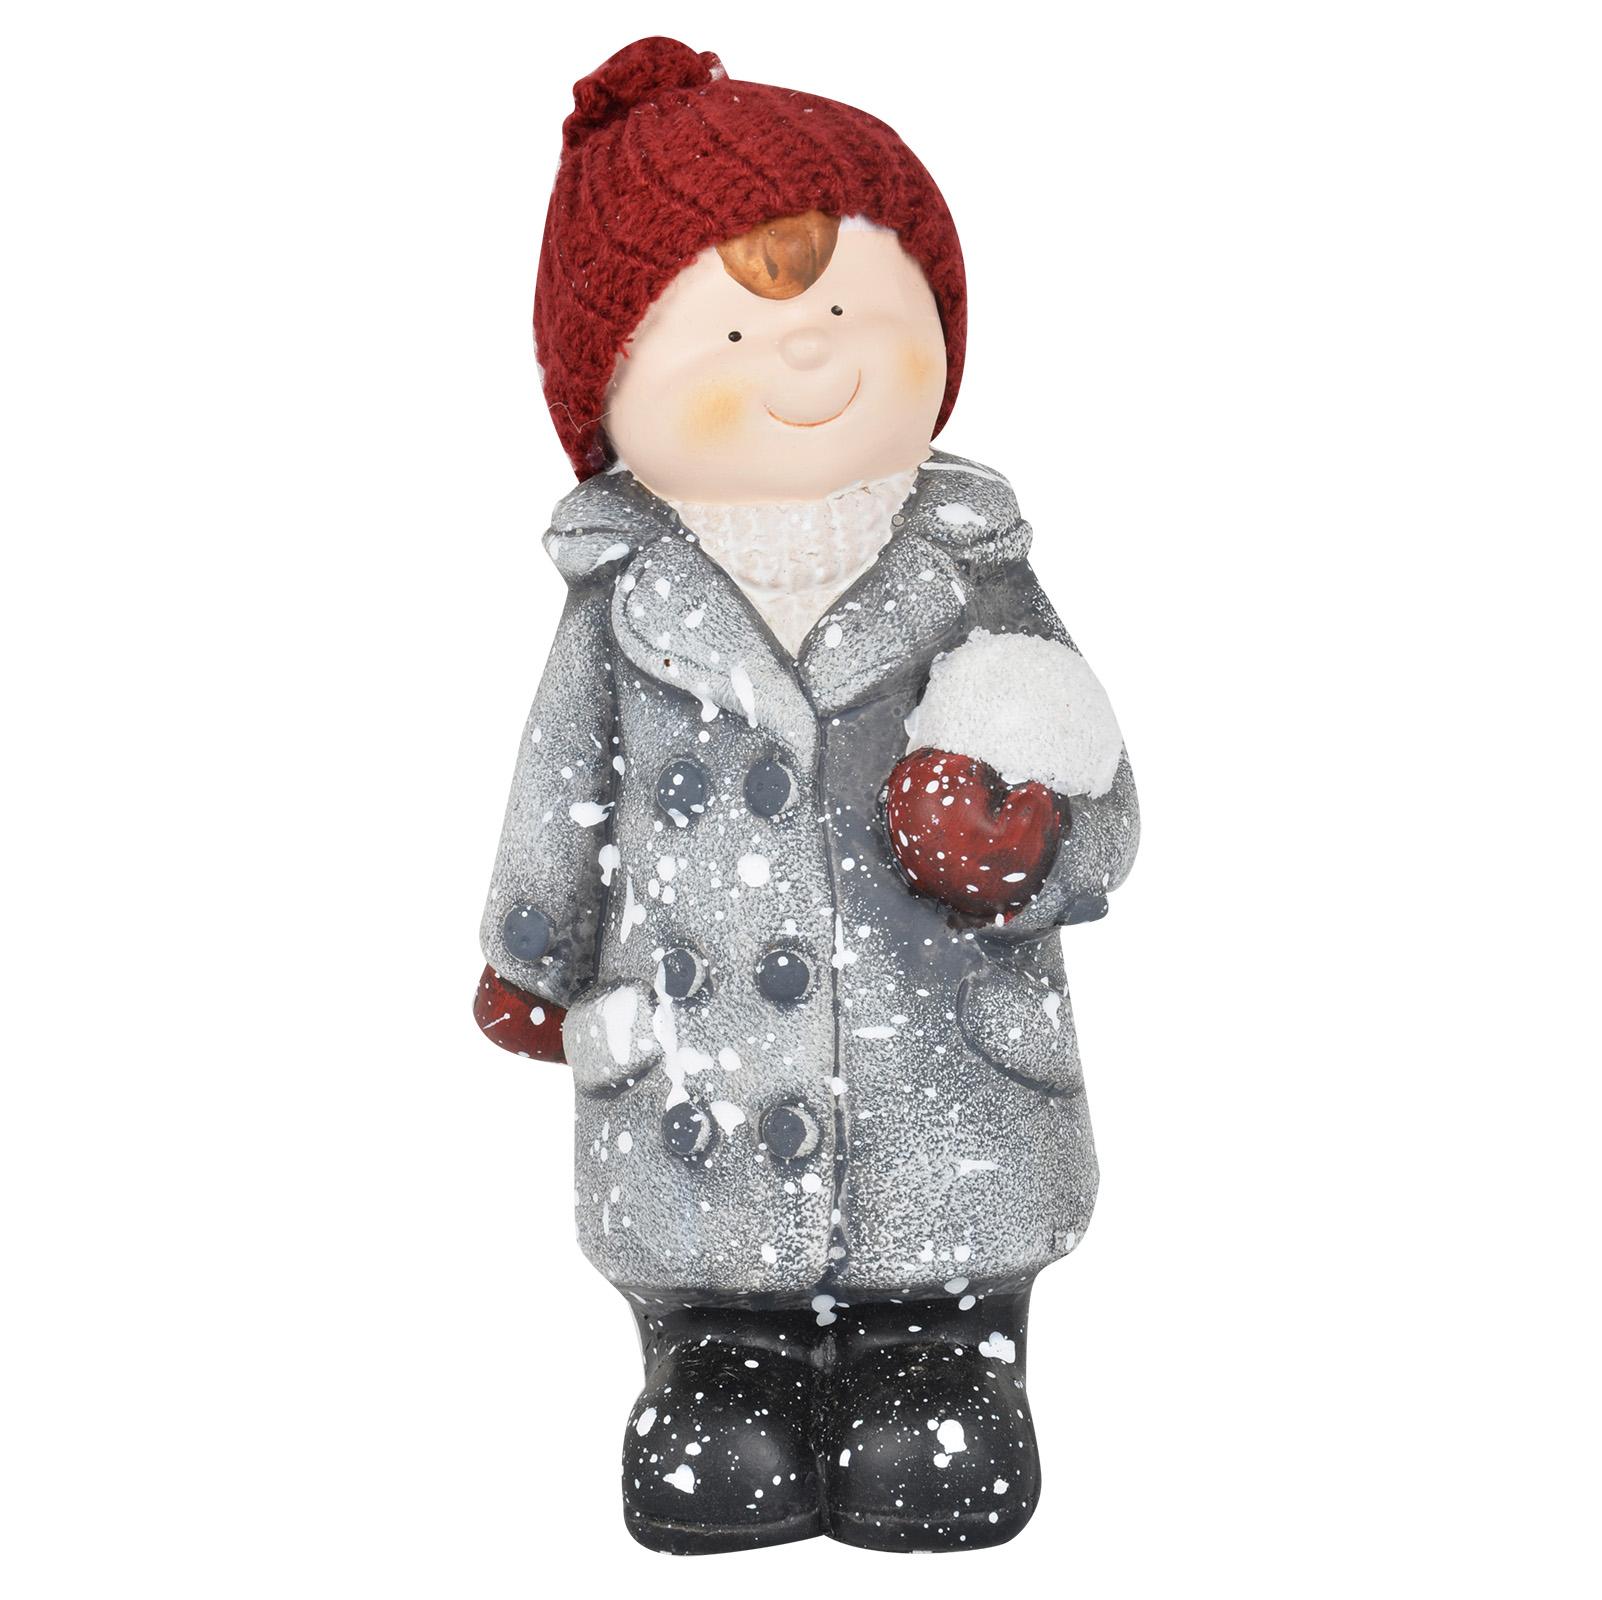 Ceramic christmas collectible boy girl figurines indoor